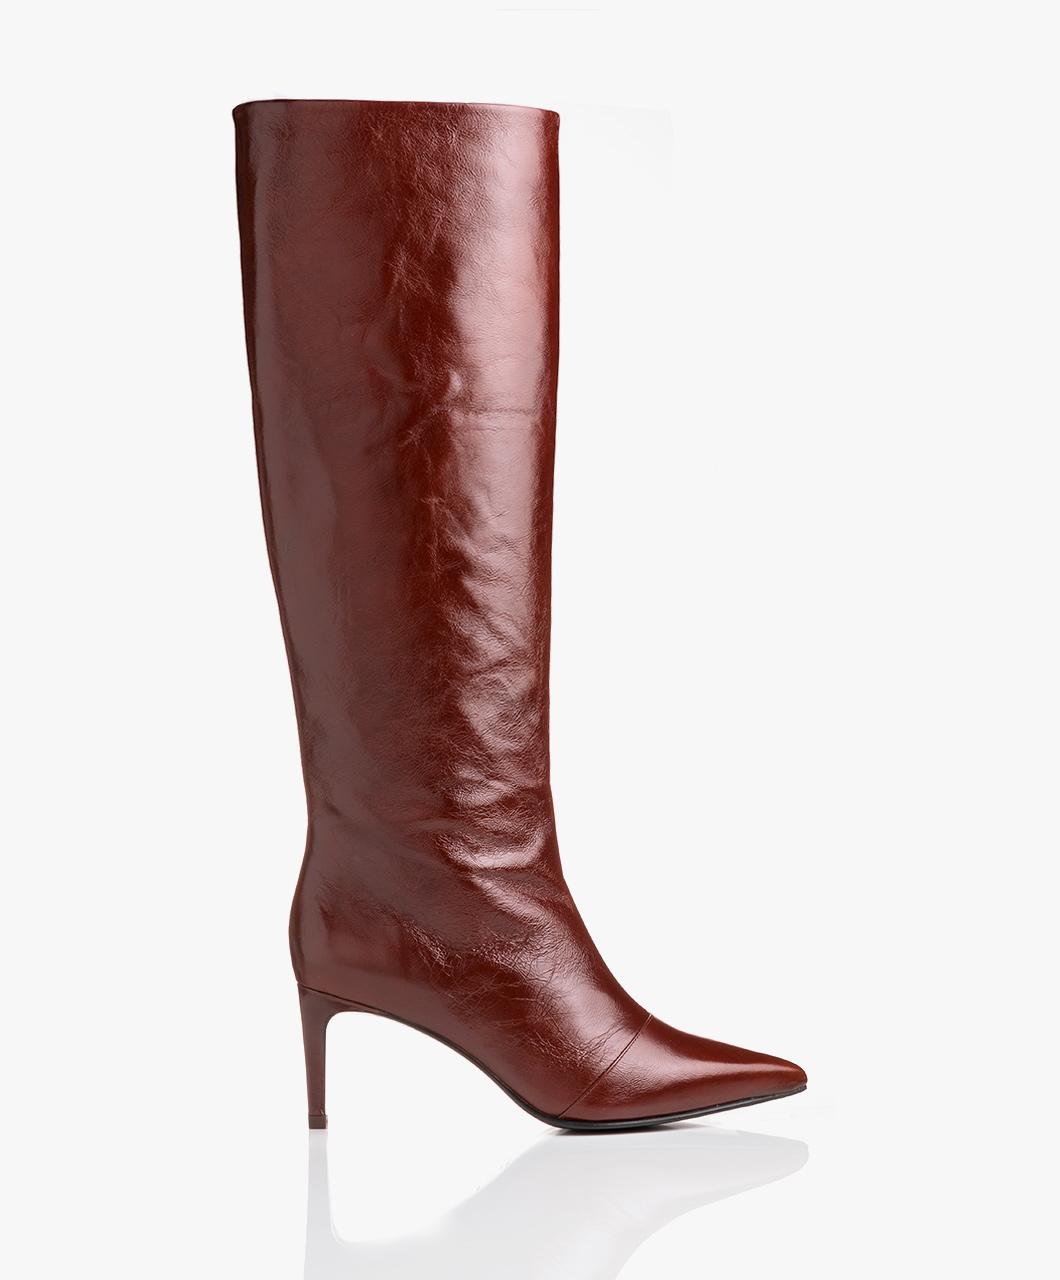 c3f26339f74 Rag   Bone Beha Knee-high Boots - Mahogany - w286f214s mhgny